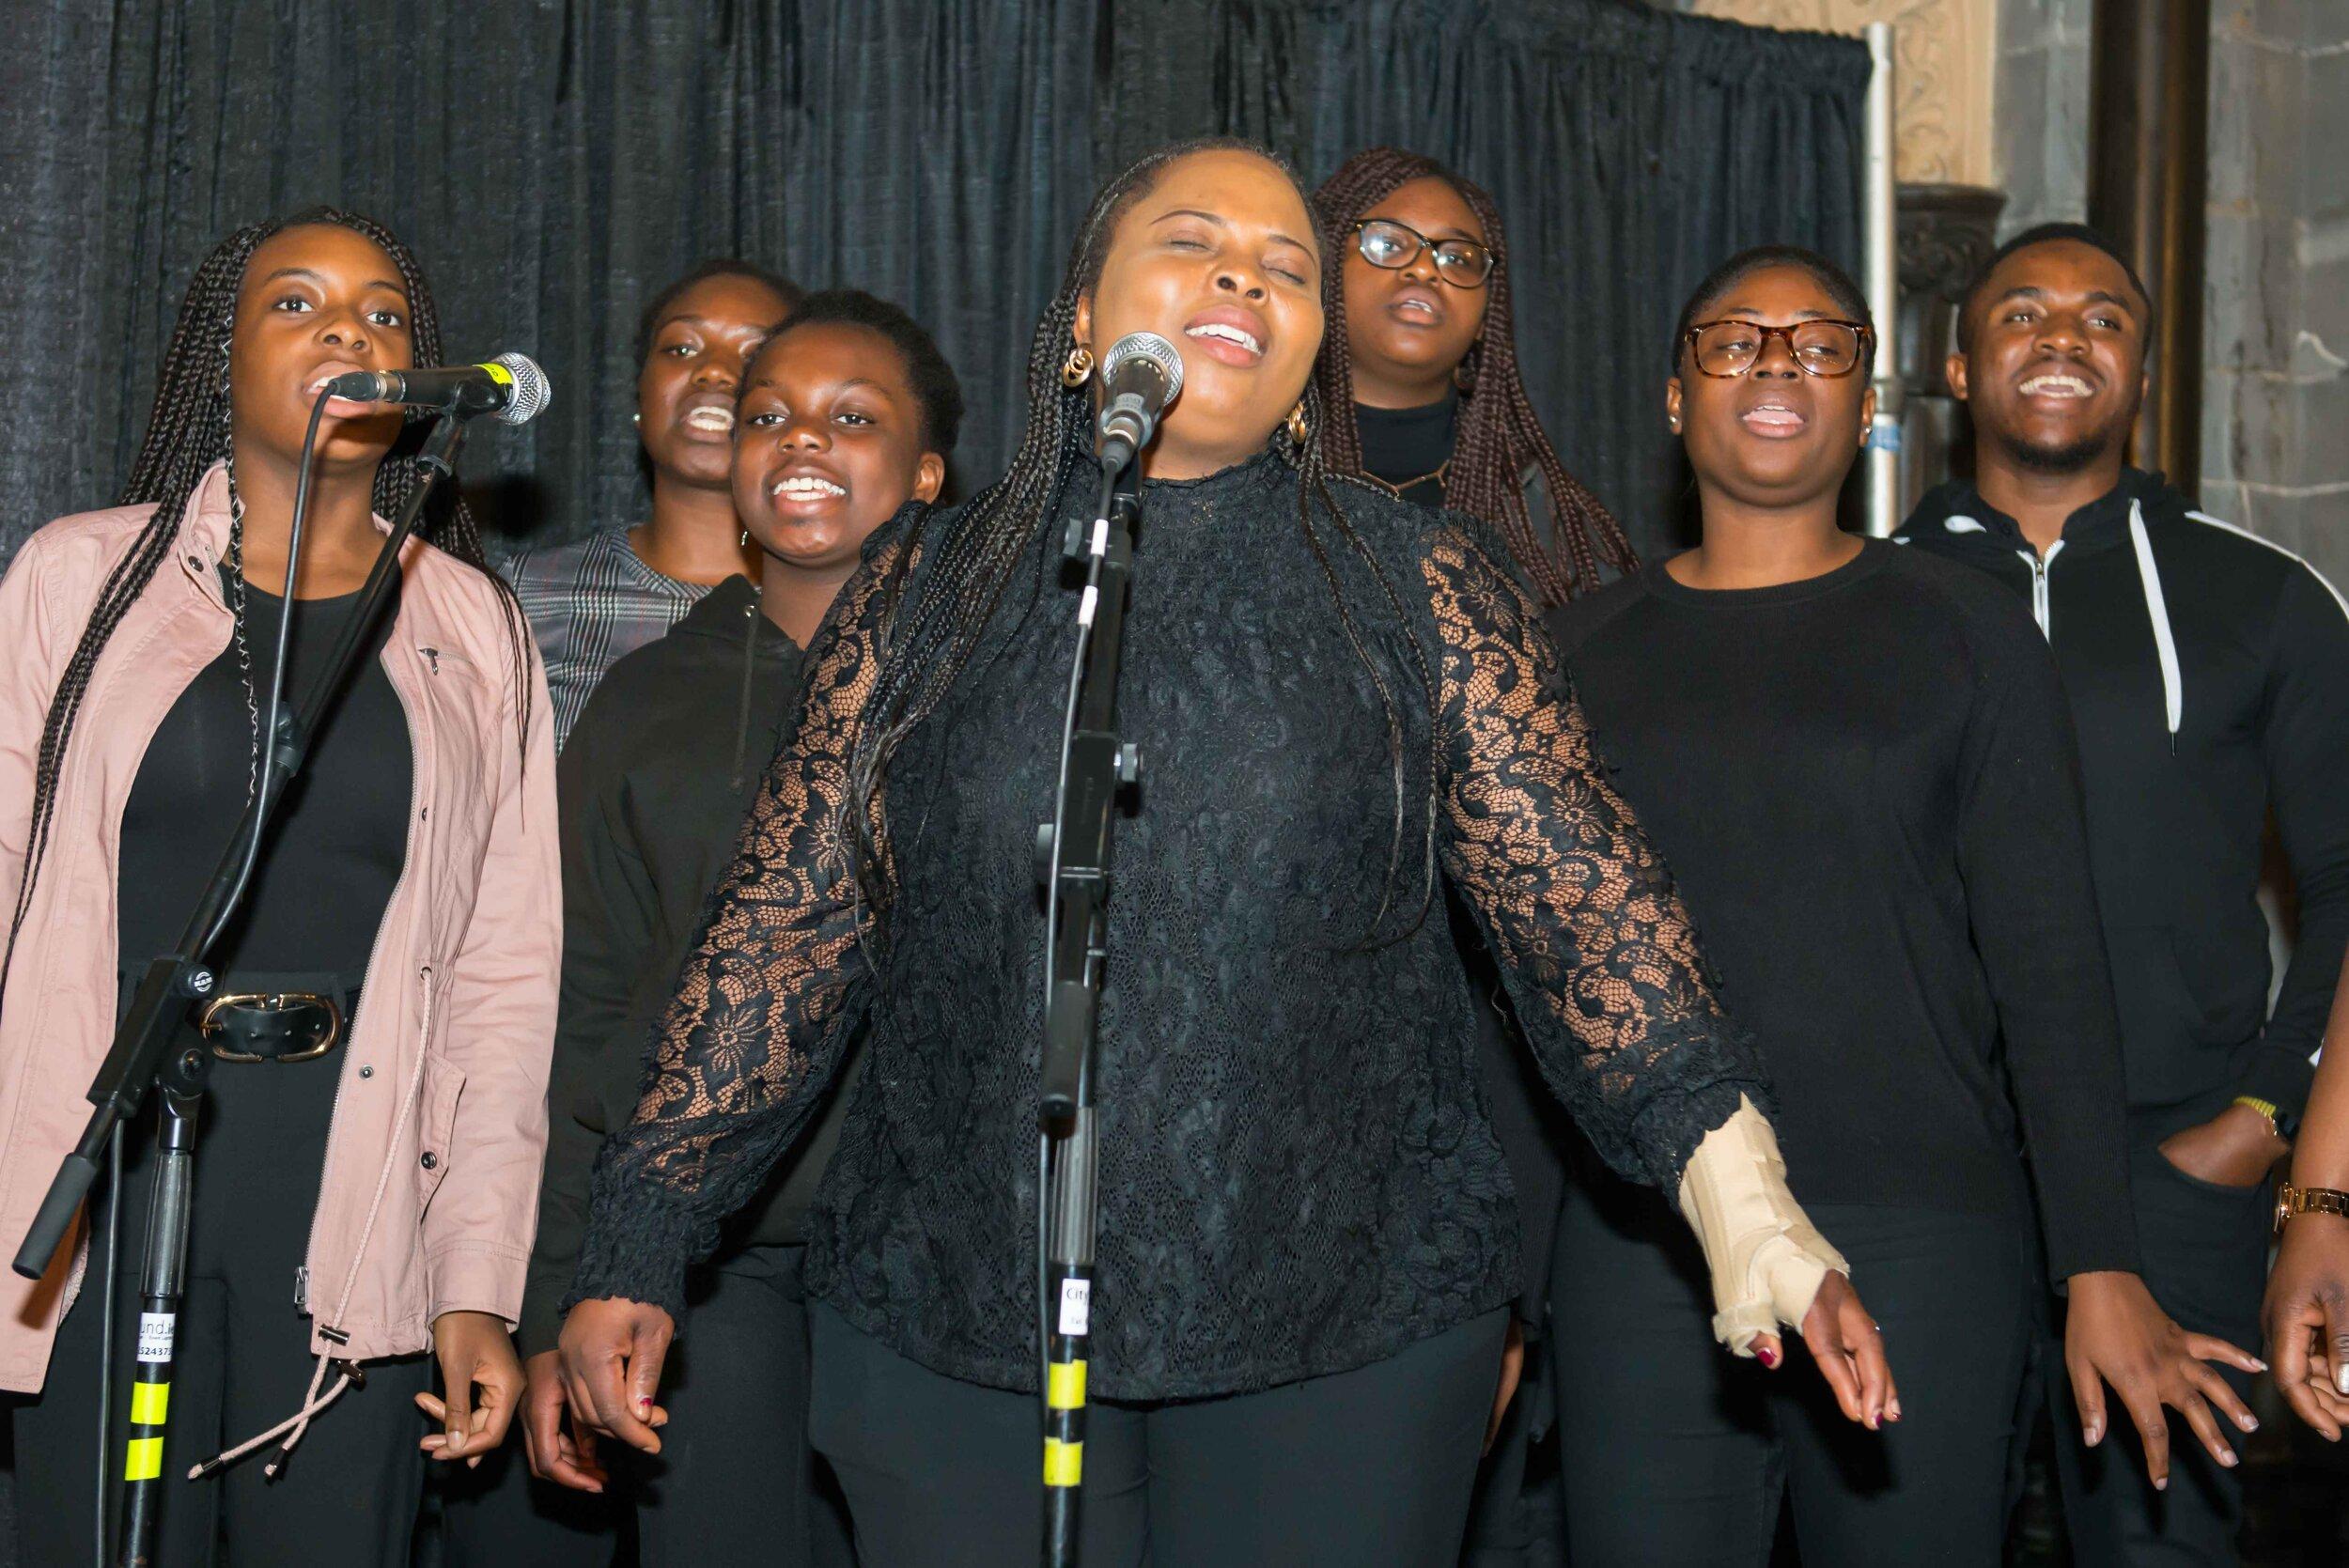 Concert in the Dark_Rehearsal_African Gospel Choir Dublin.jpg